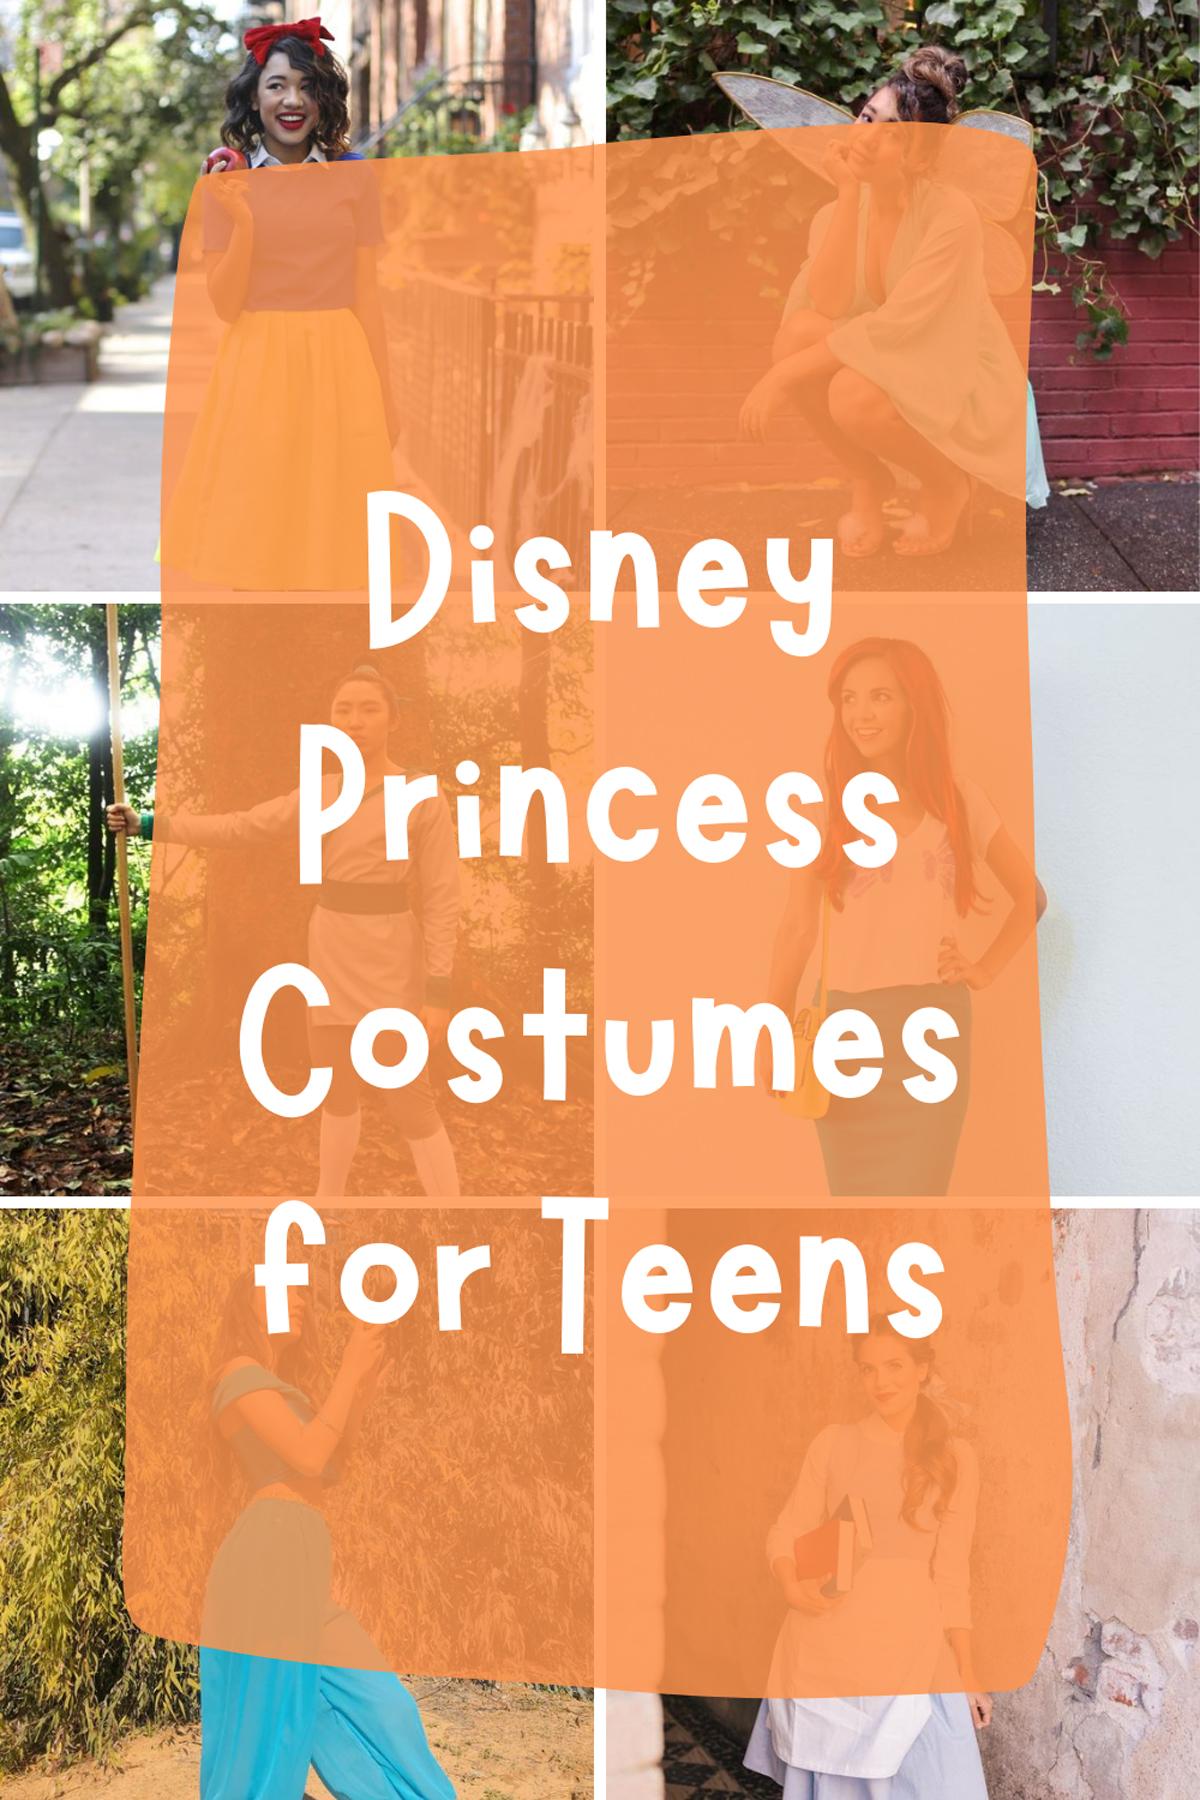 Disney Princess Costumes for Teens